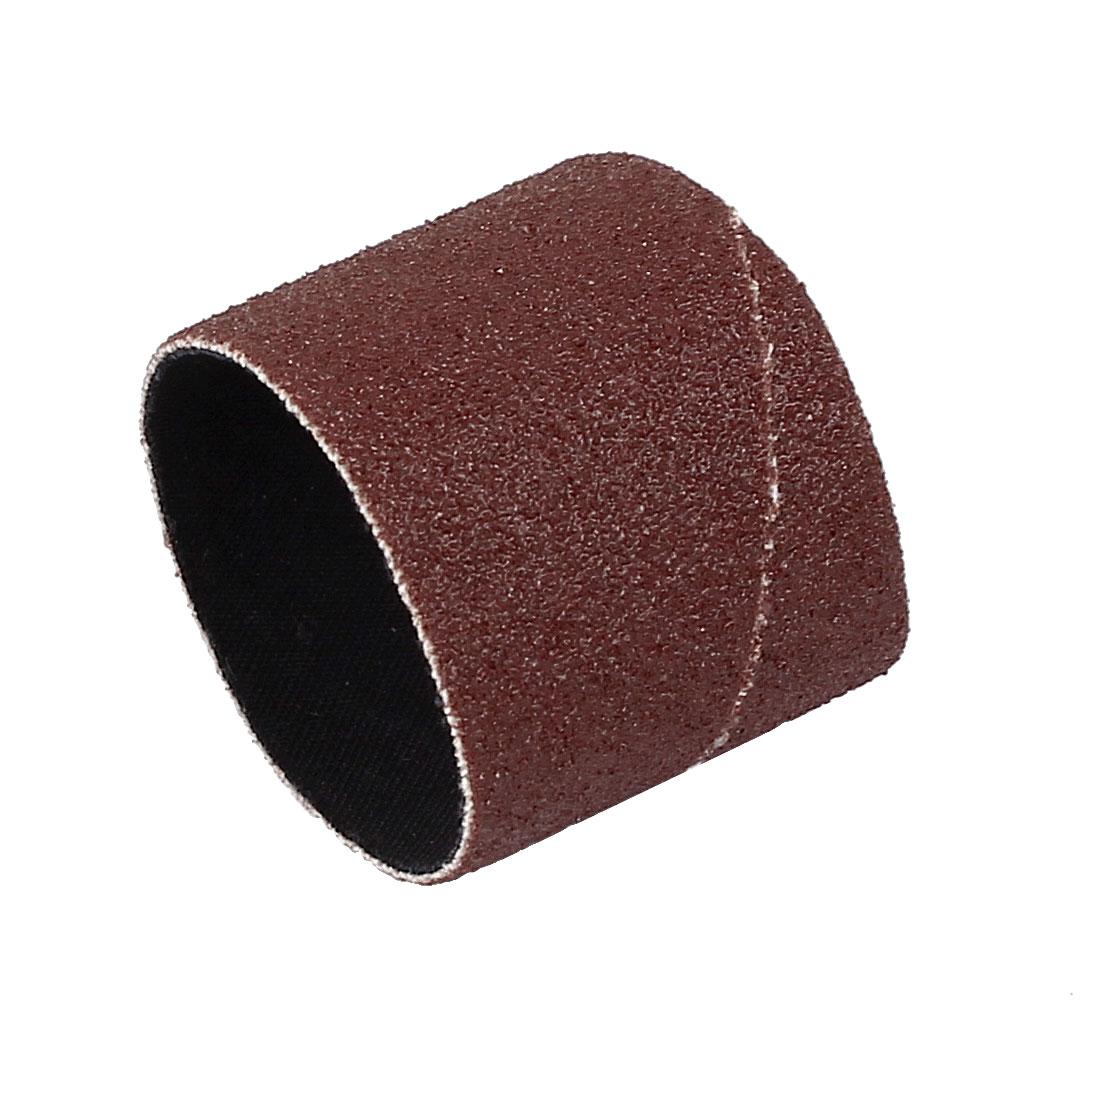 25.4mm Diameter 120 Grit Abrasive Cloth Spiral Band Sleeves Rolls